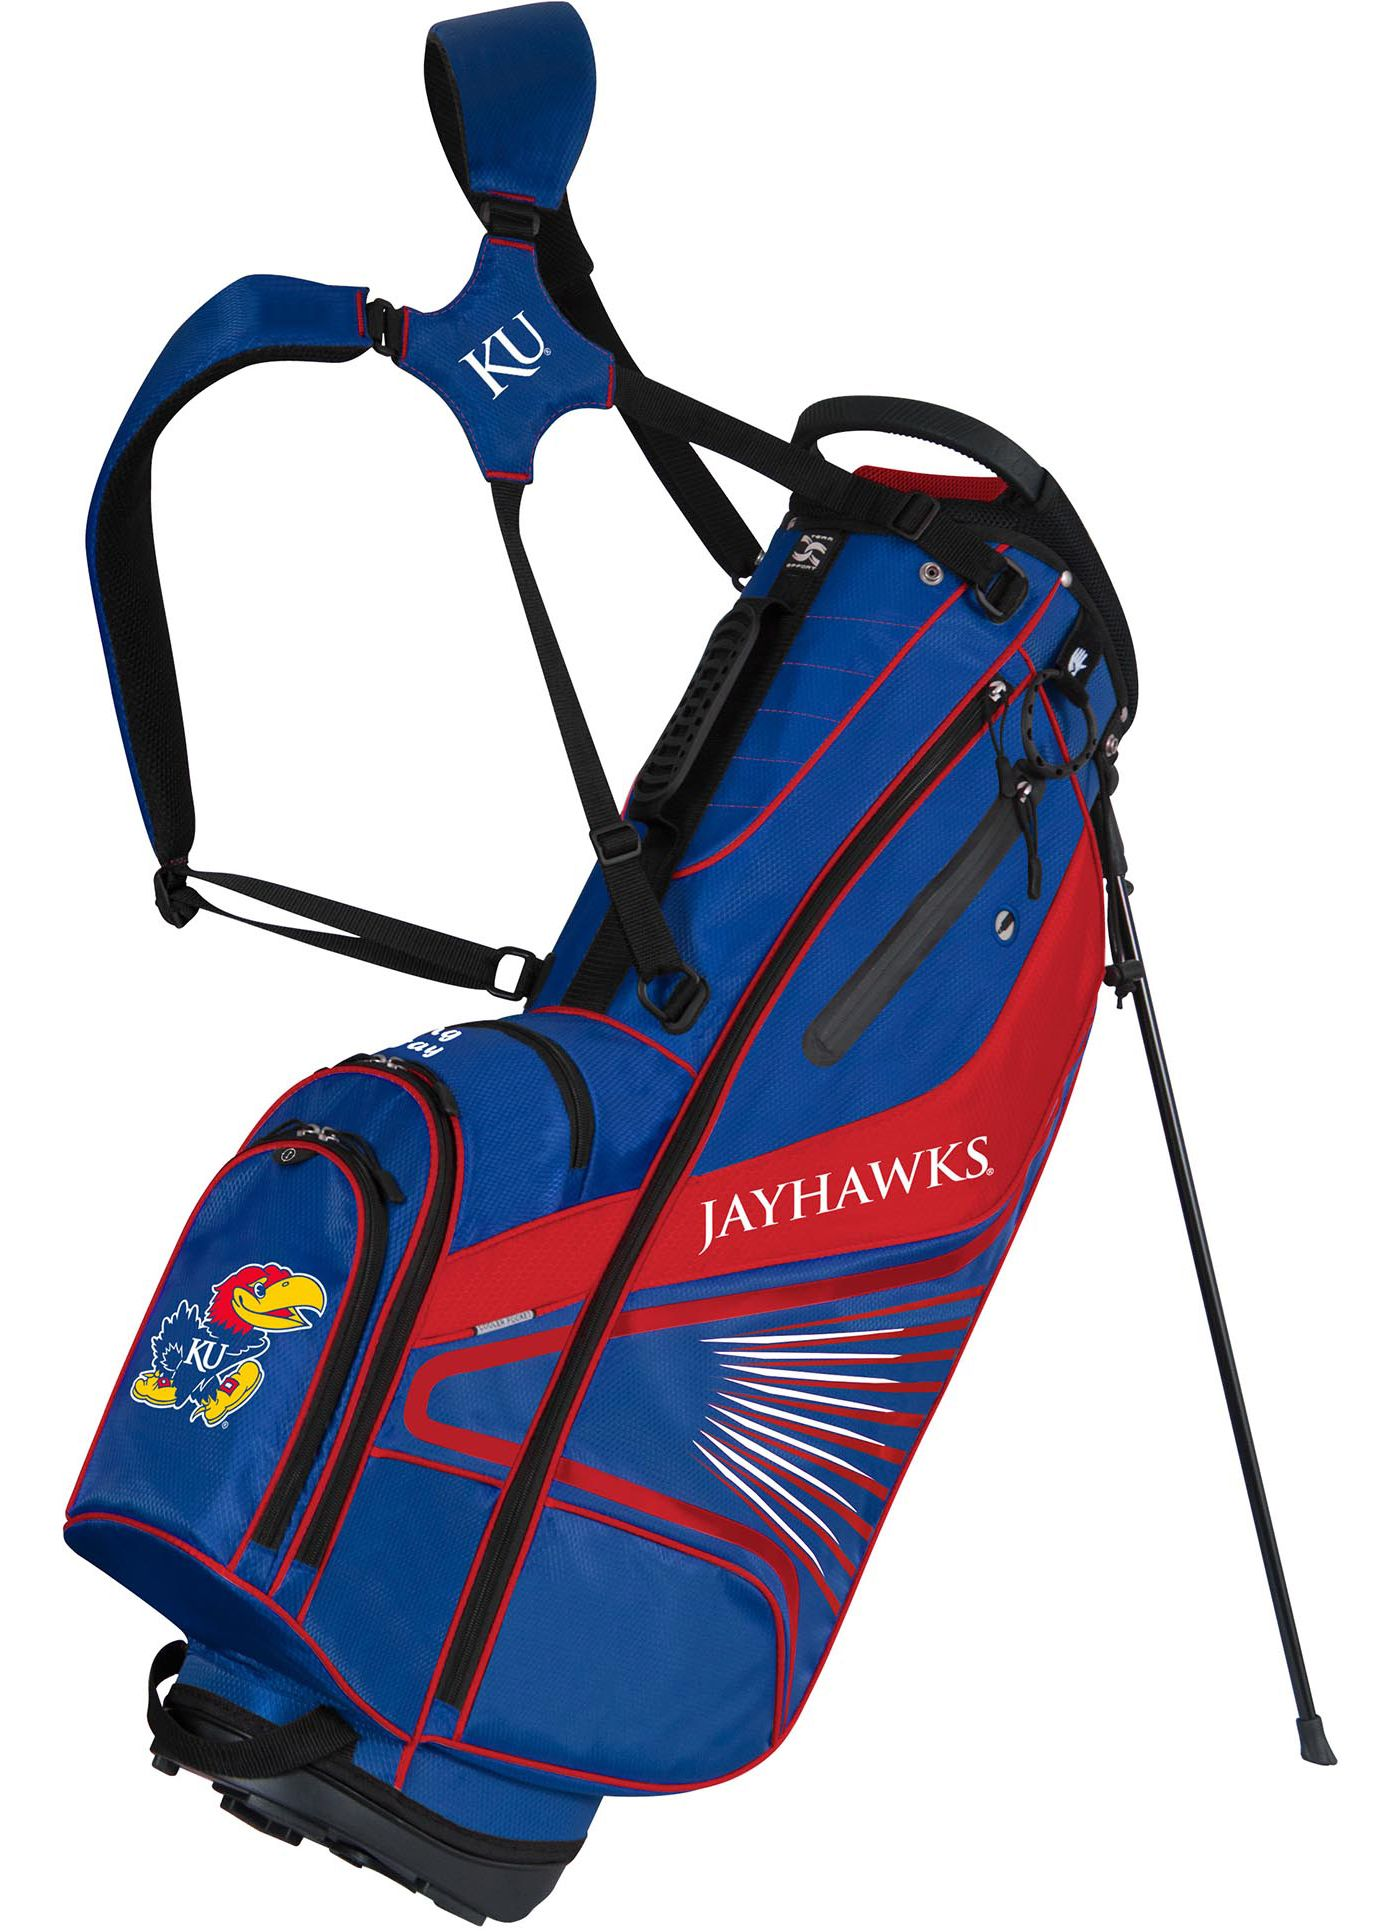 Team Effort GridIron III Kansas Jayhawks Stand Bag